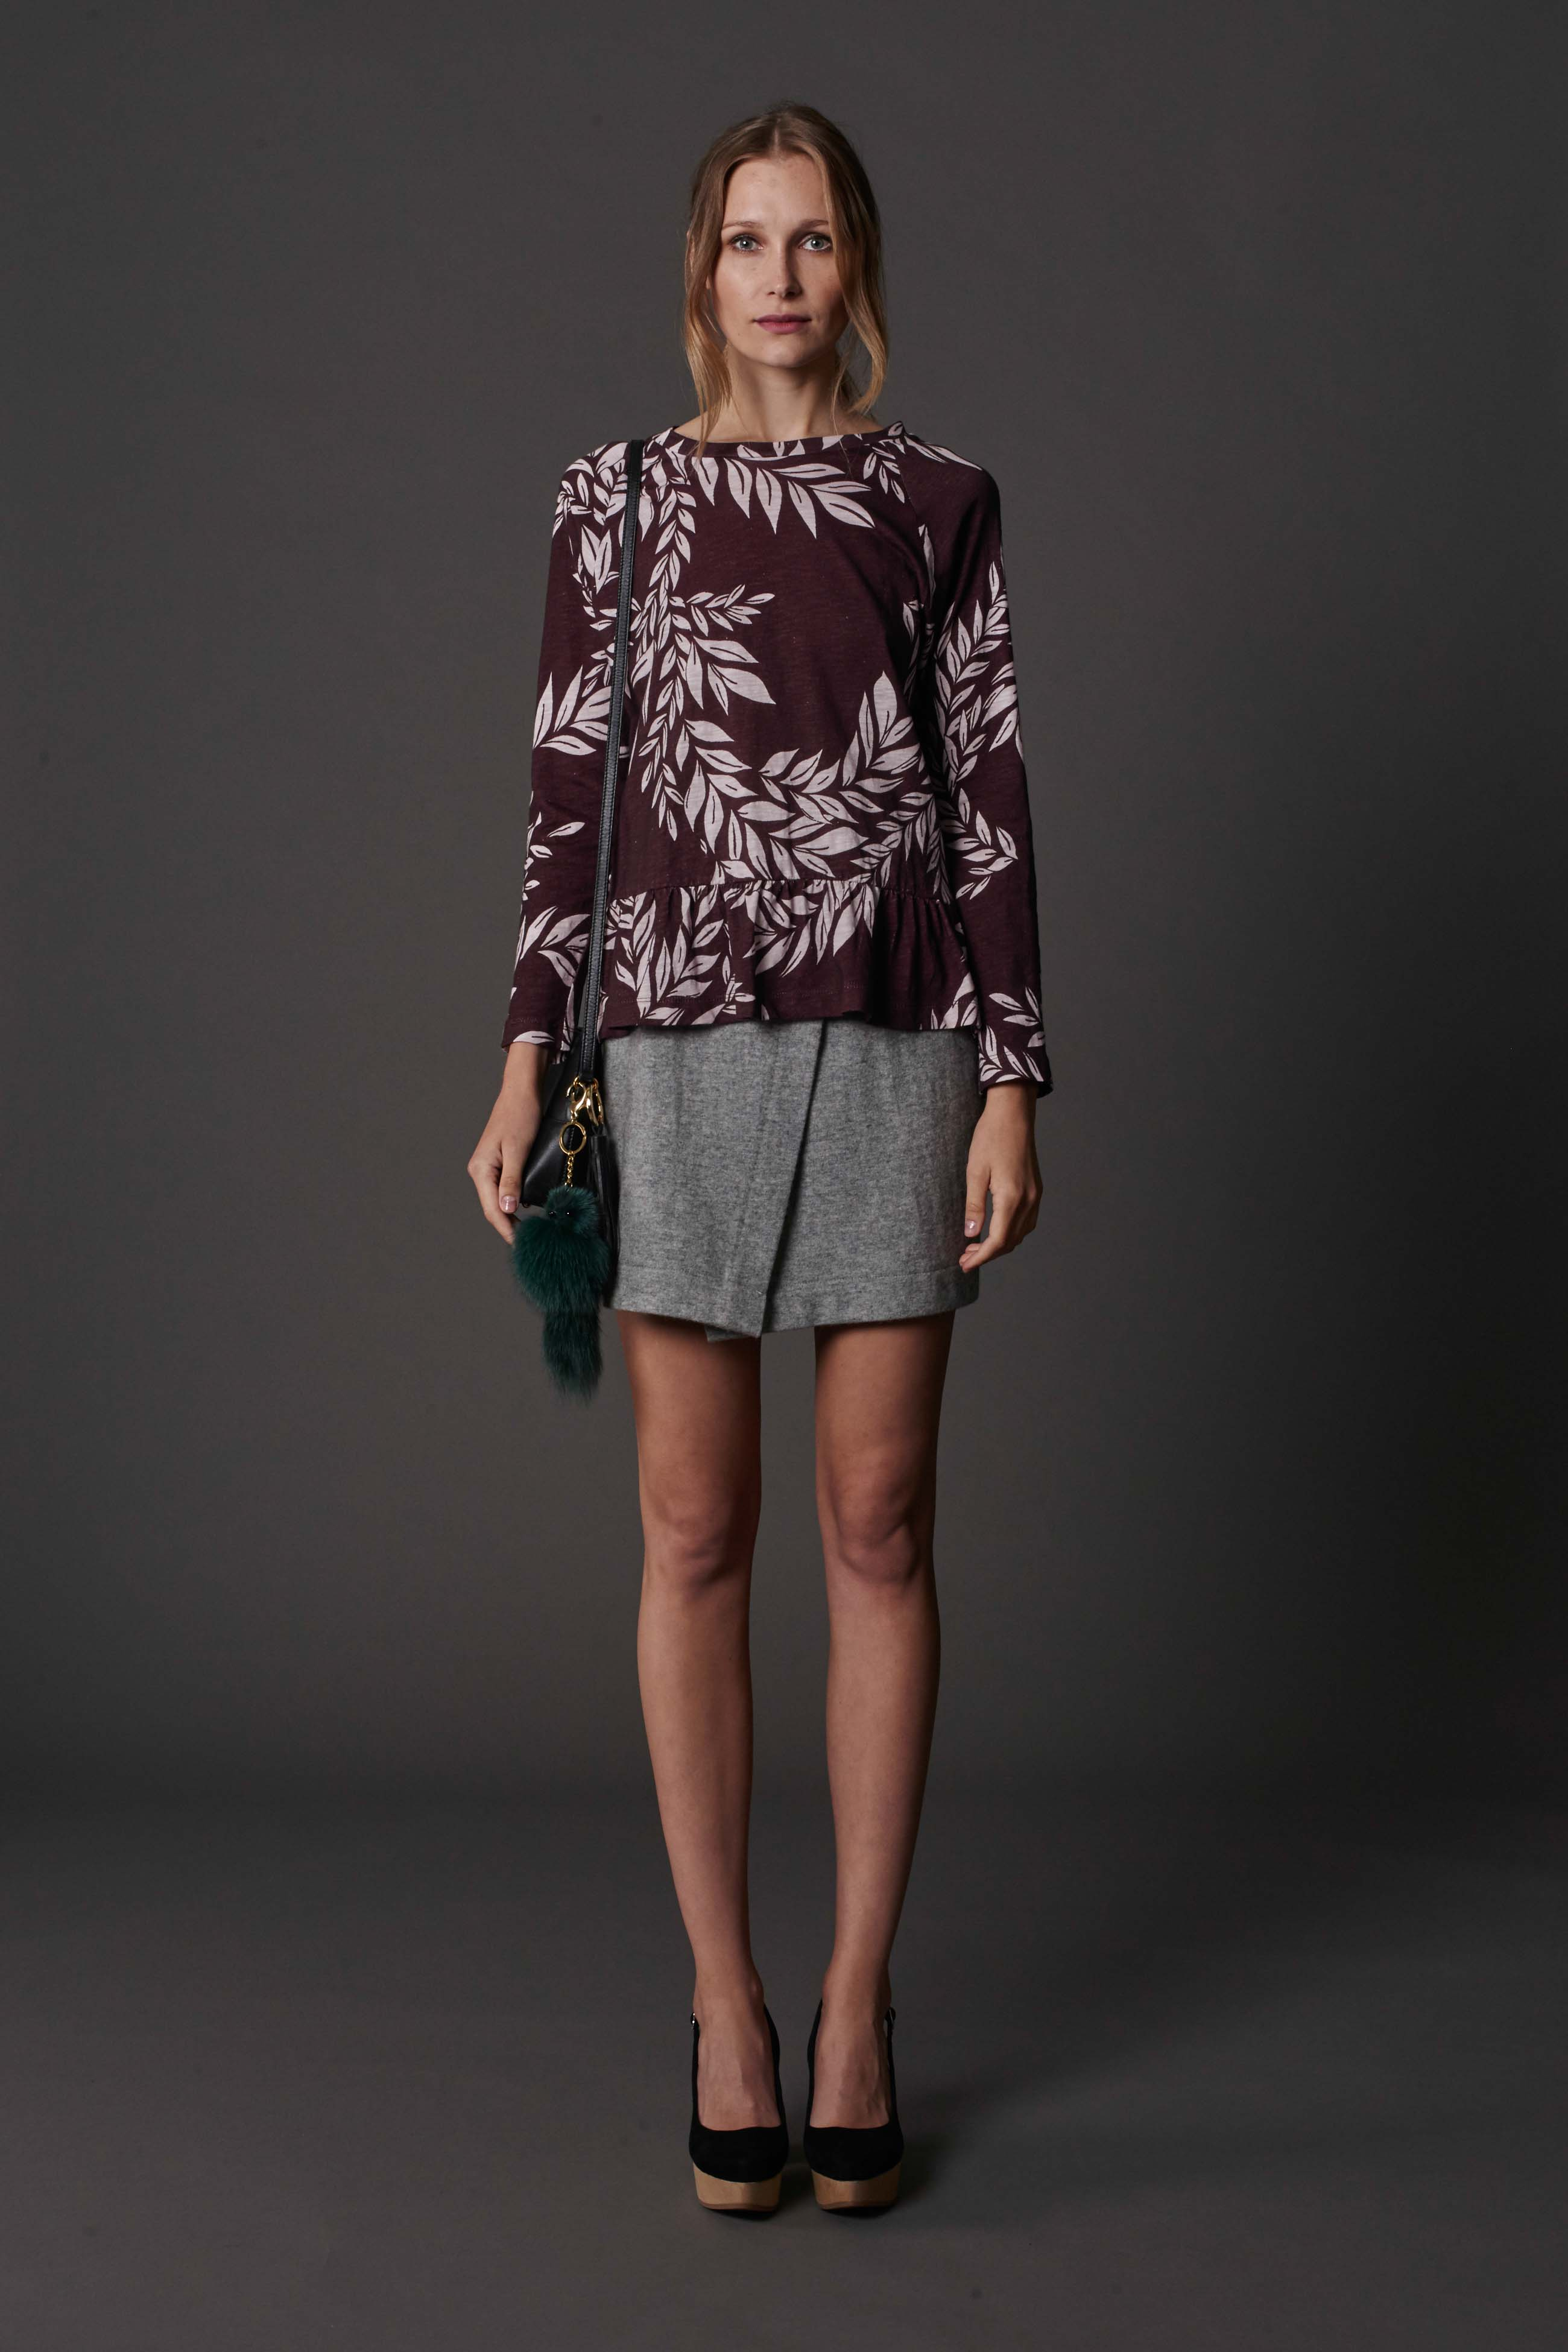 RUBY Iva Ruffle Longsleeve, Alta Wrap Miniskirt, Lila Shoulder Bag